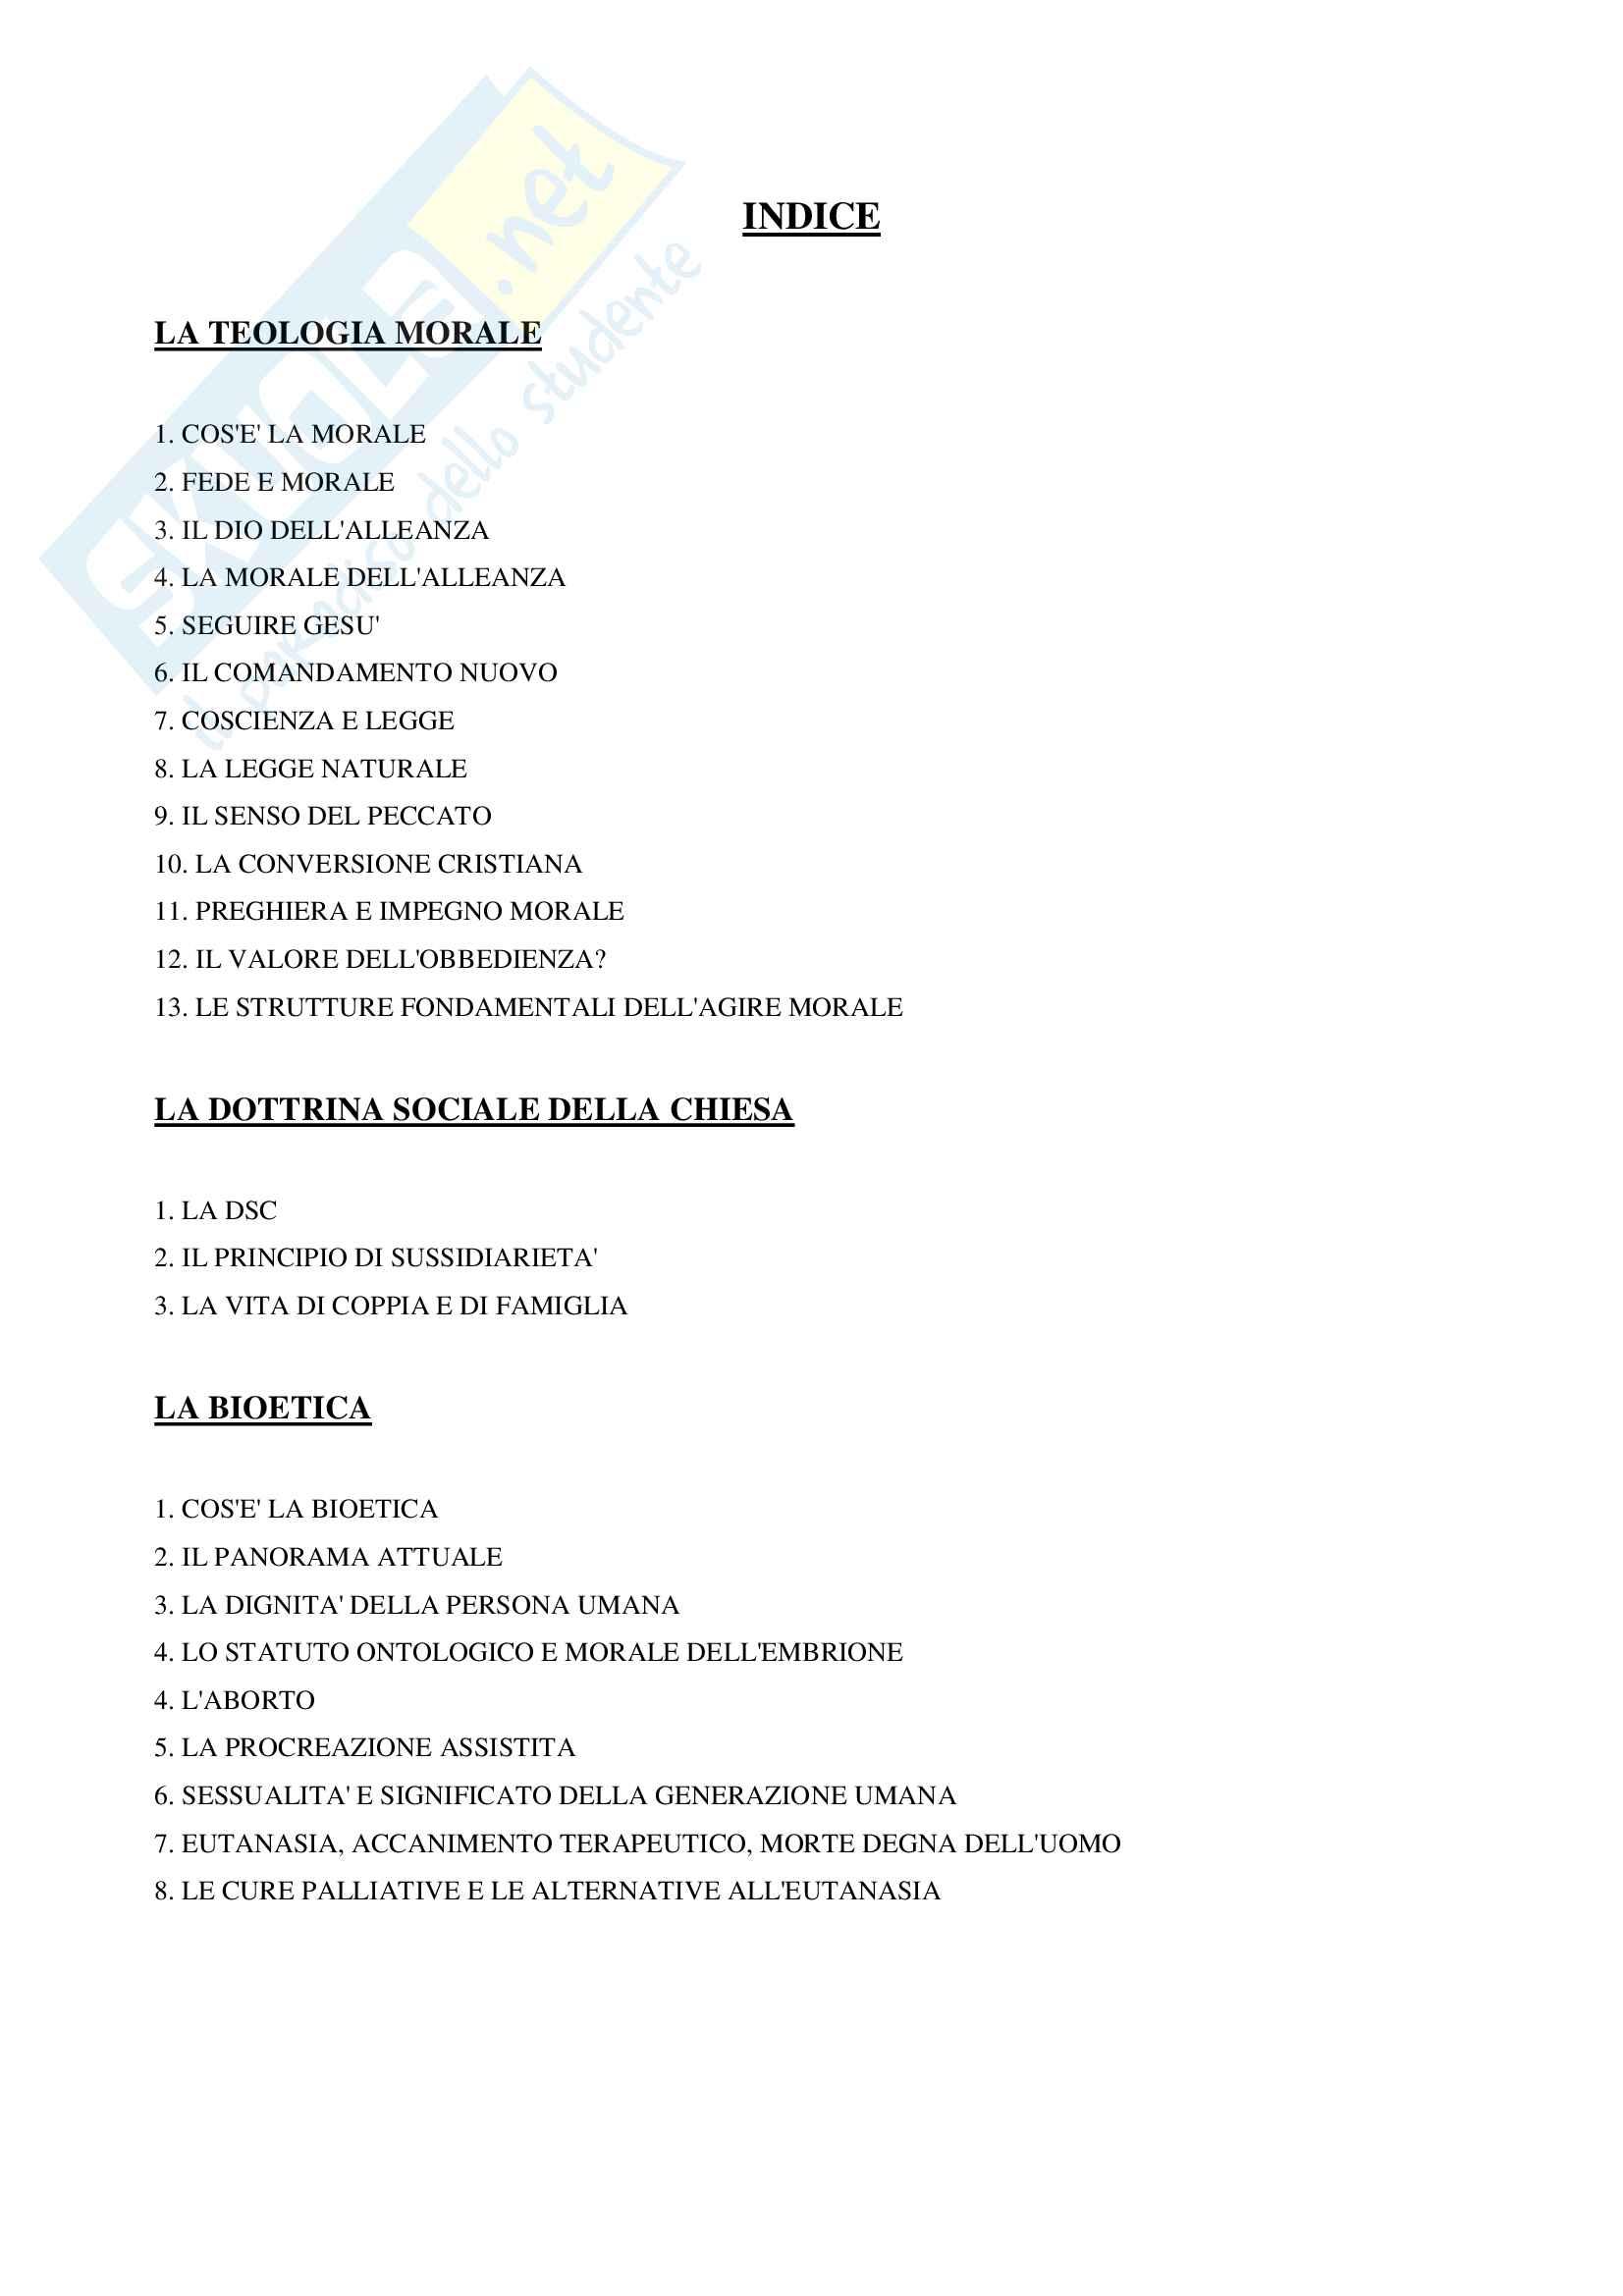 Appunti Teologia 3 Aramini